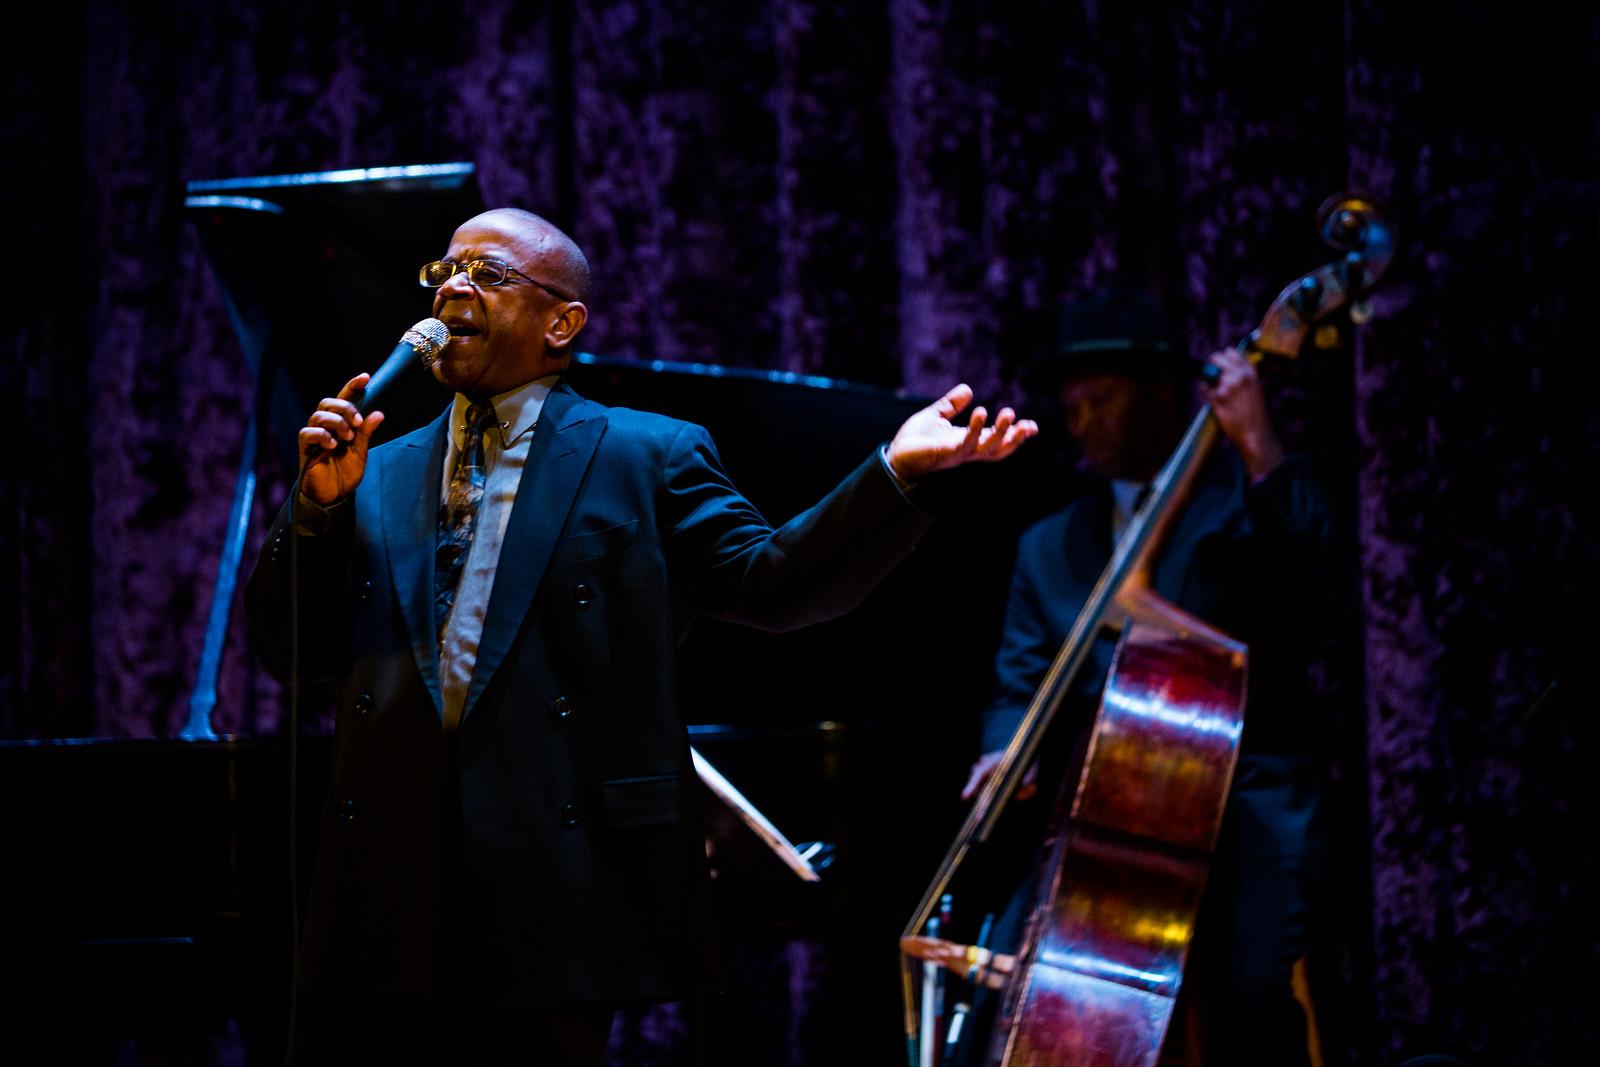 Living-Jazz-MLK-Tribute-2017-Oakland-by-Rosaura-Studios-75-X3.jpg